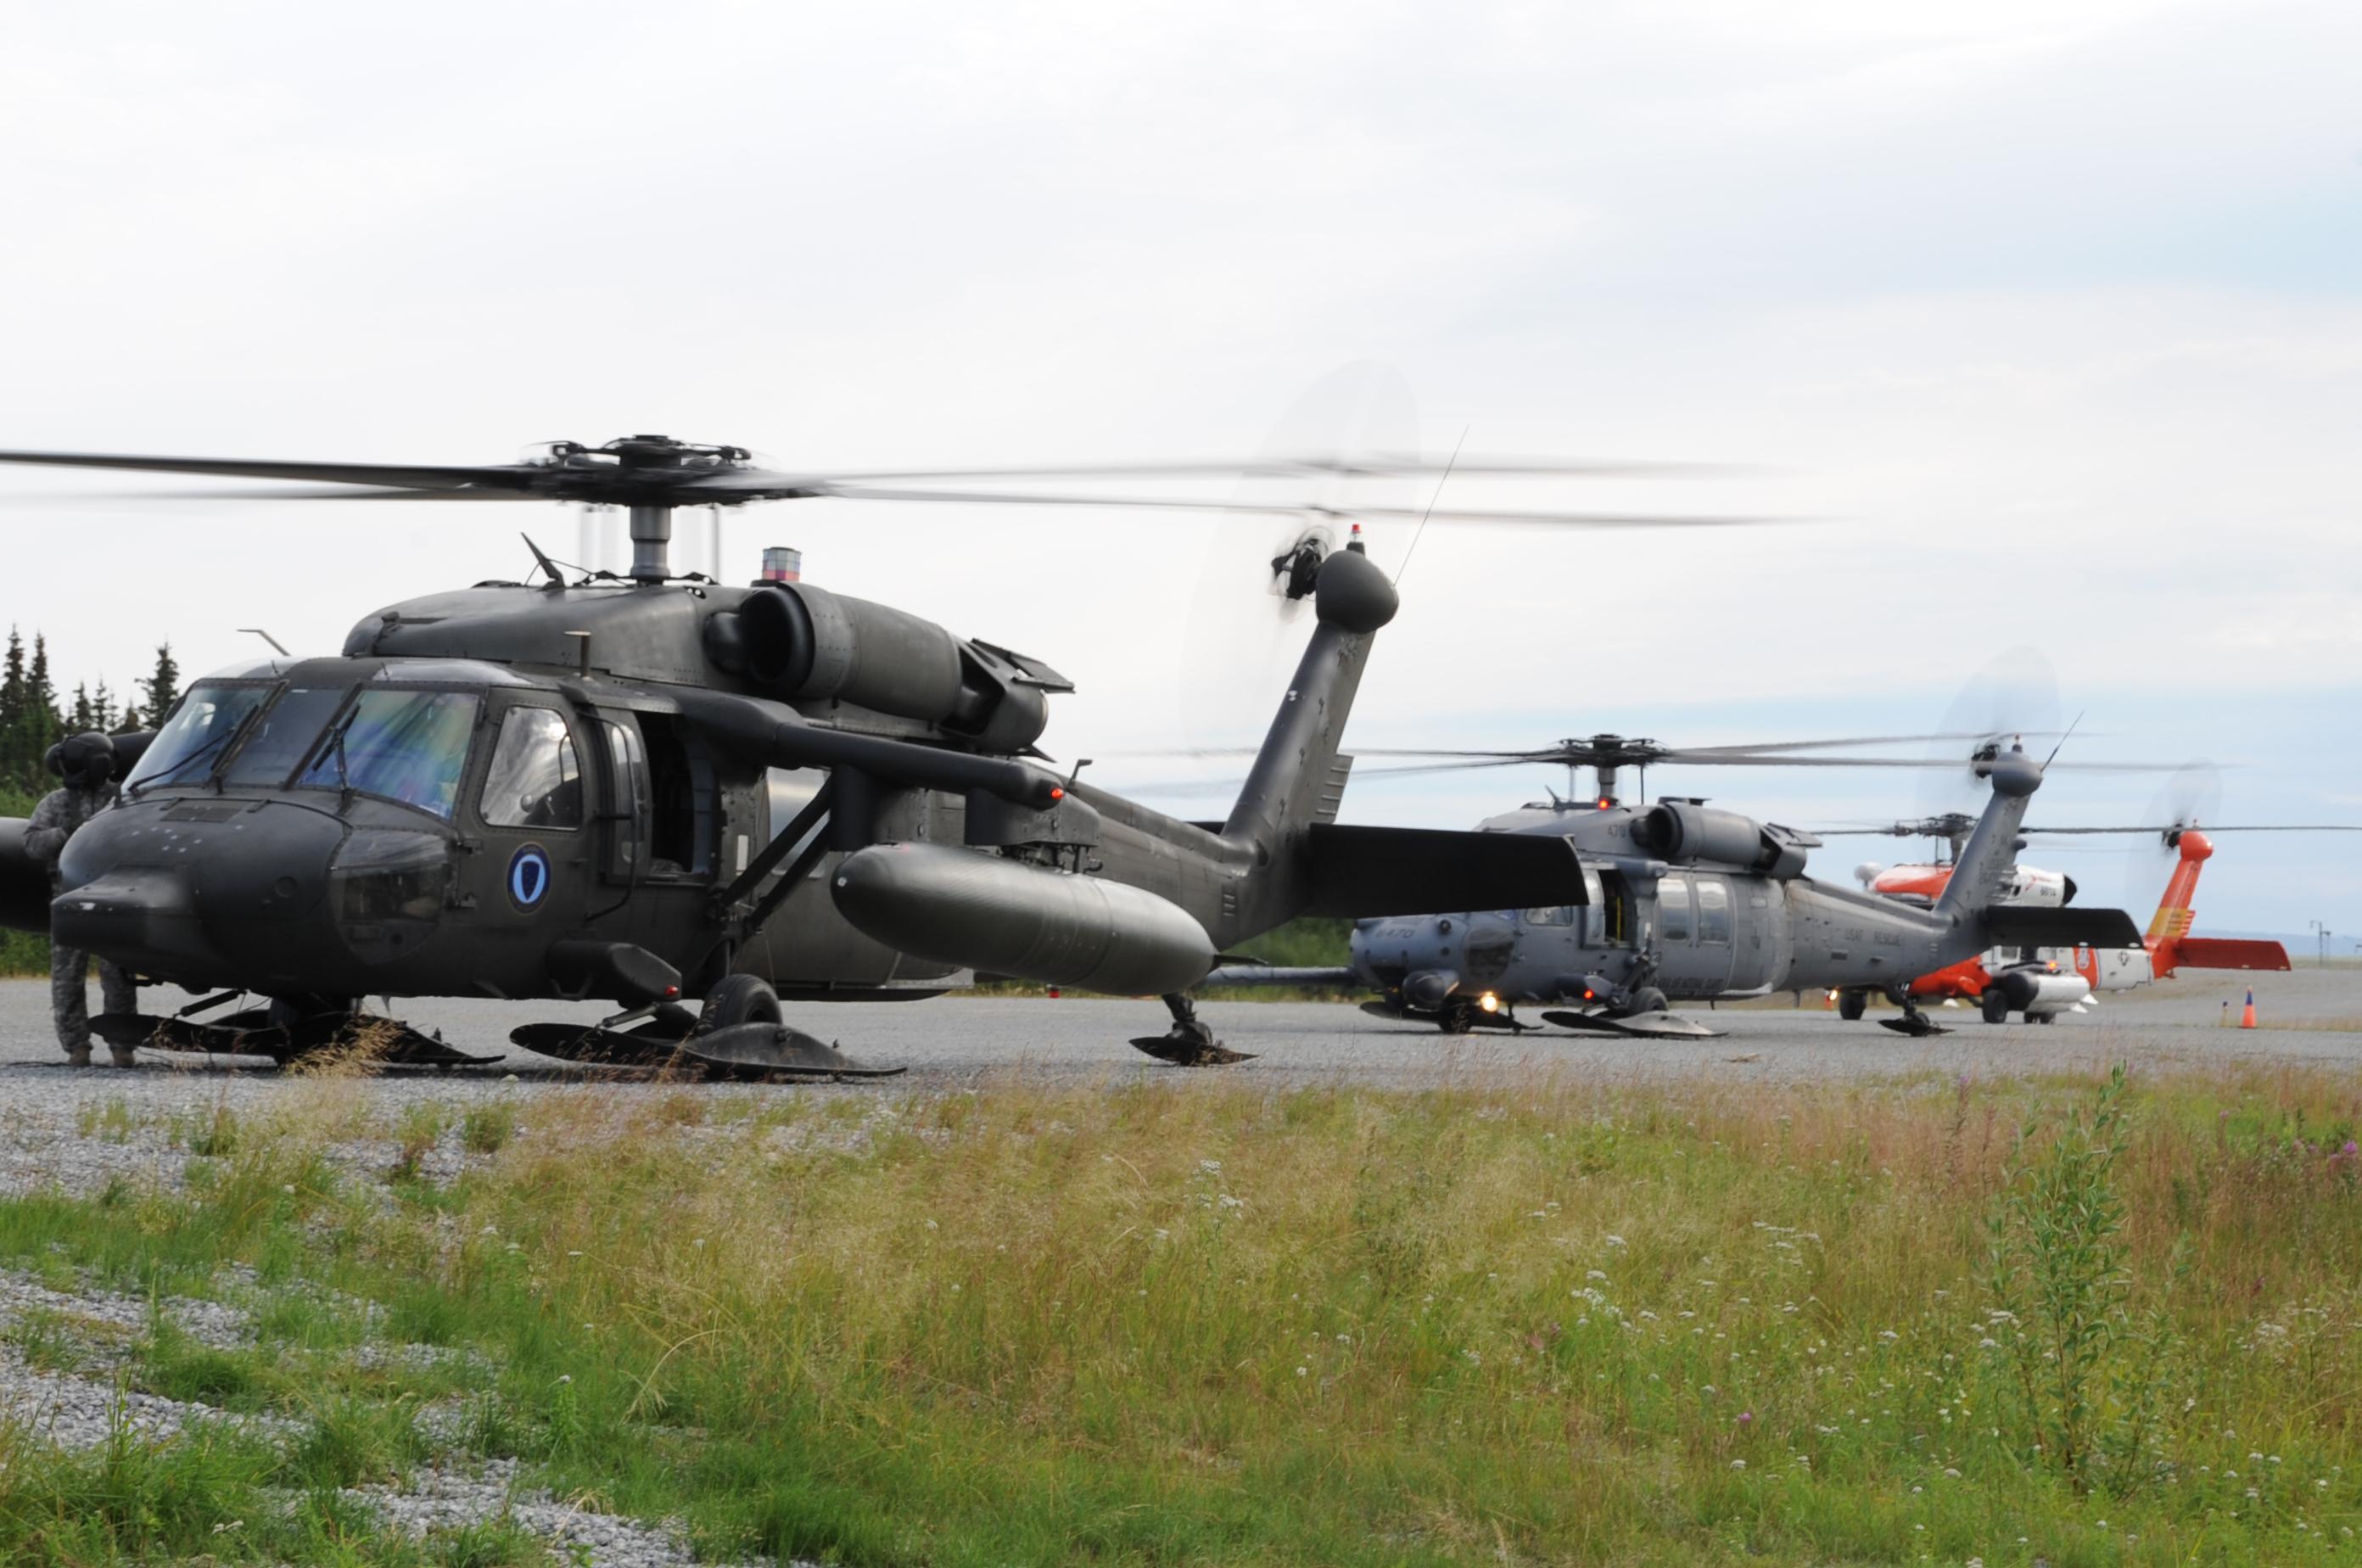 c8ccf7711f3 Sikorsky UH-60 Black Hawk | Military Wiki | FANDOM powered by Wikia